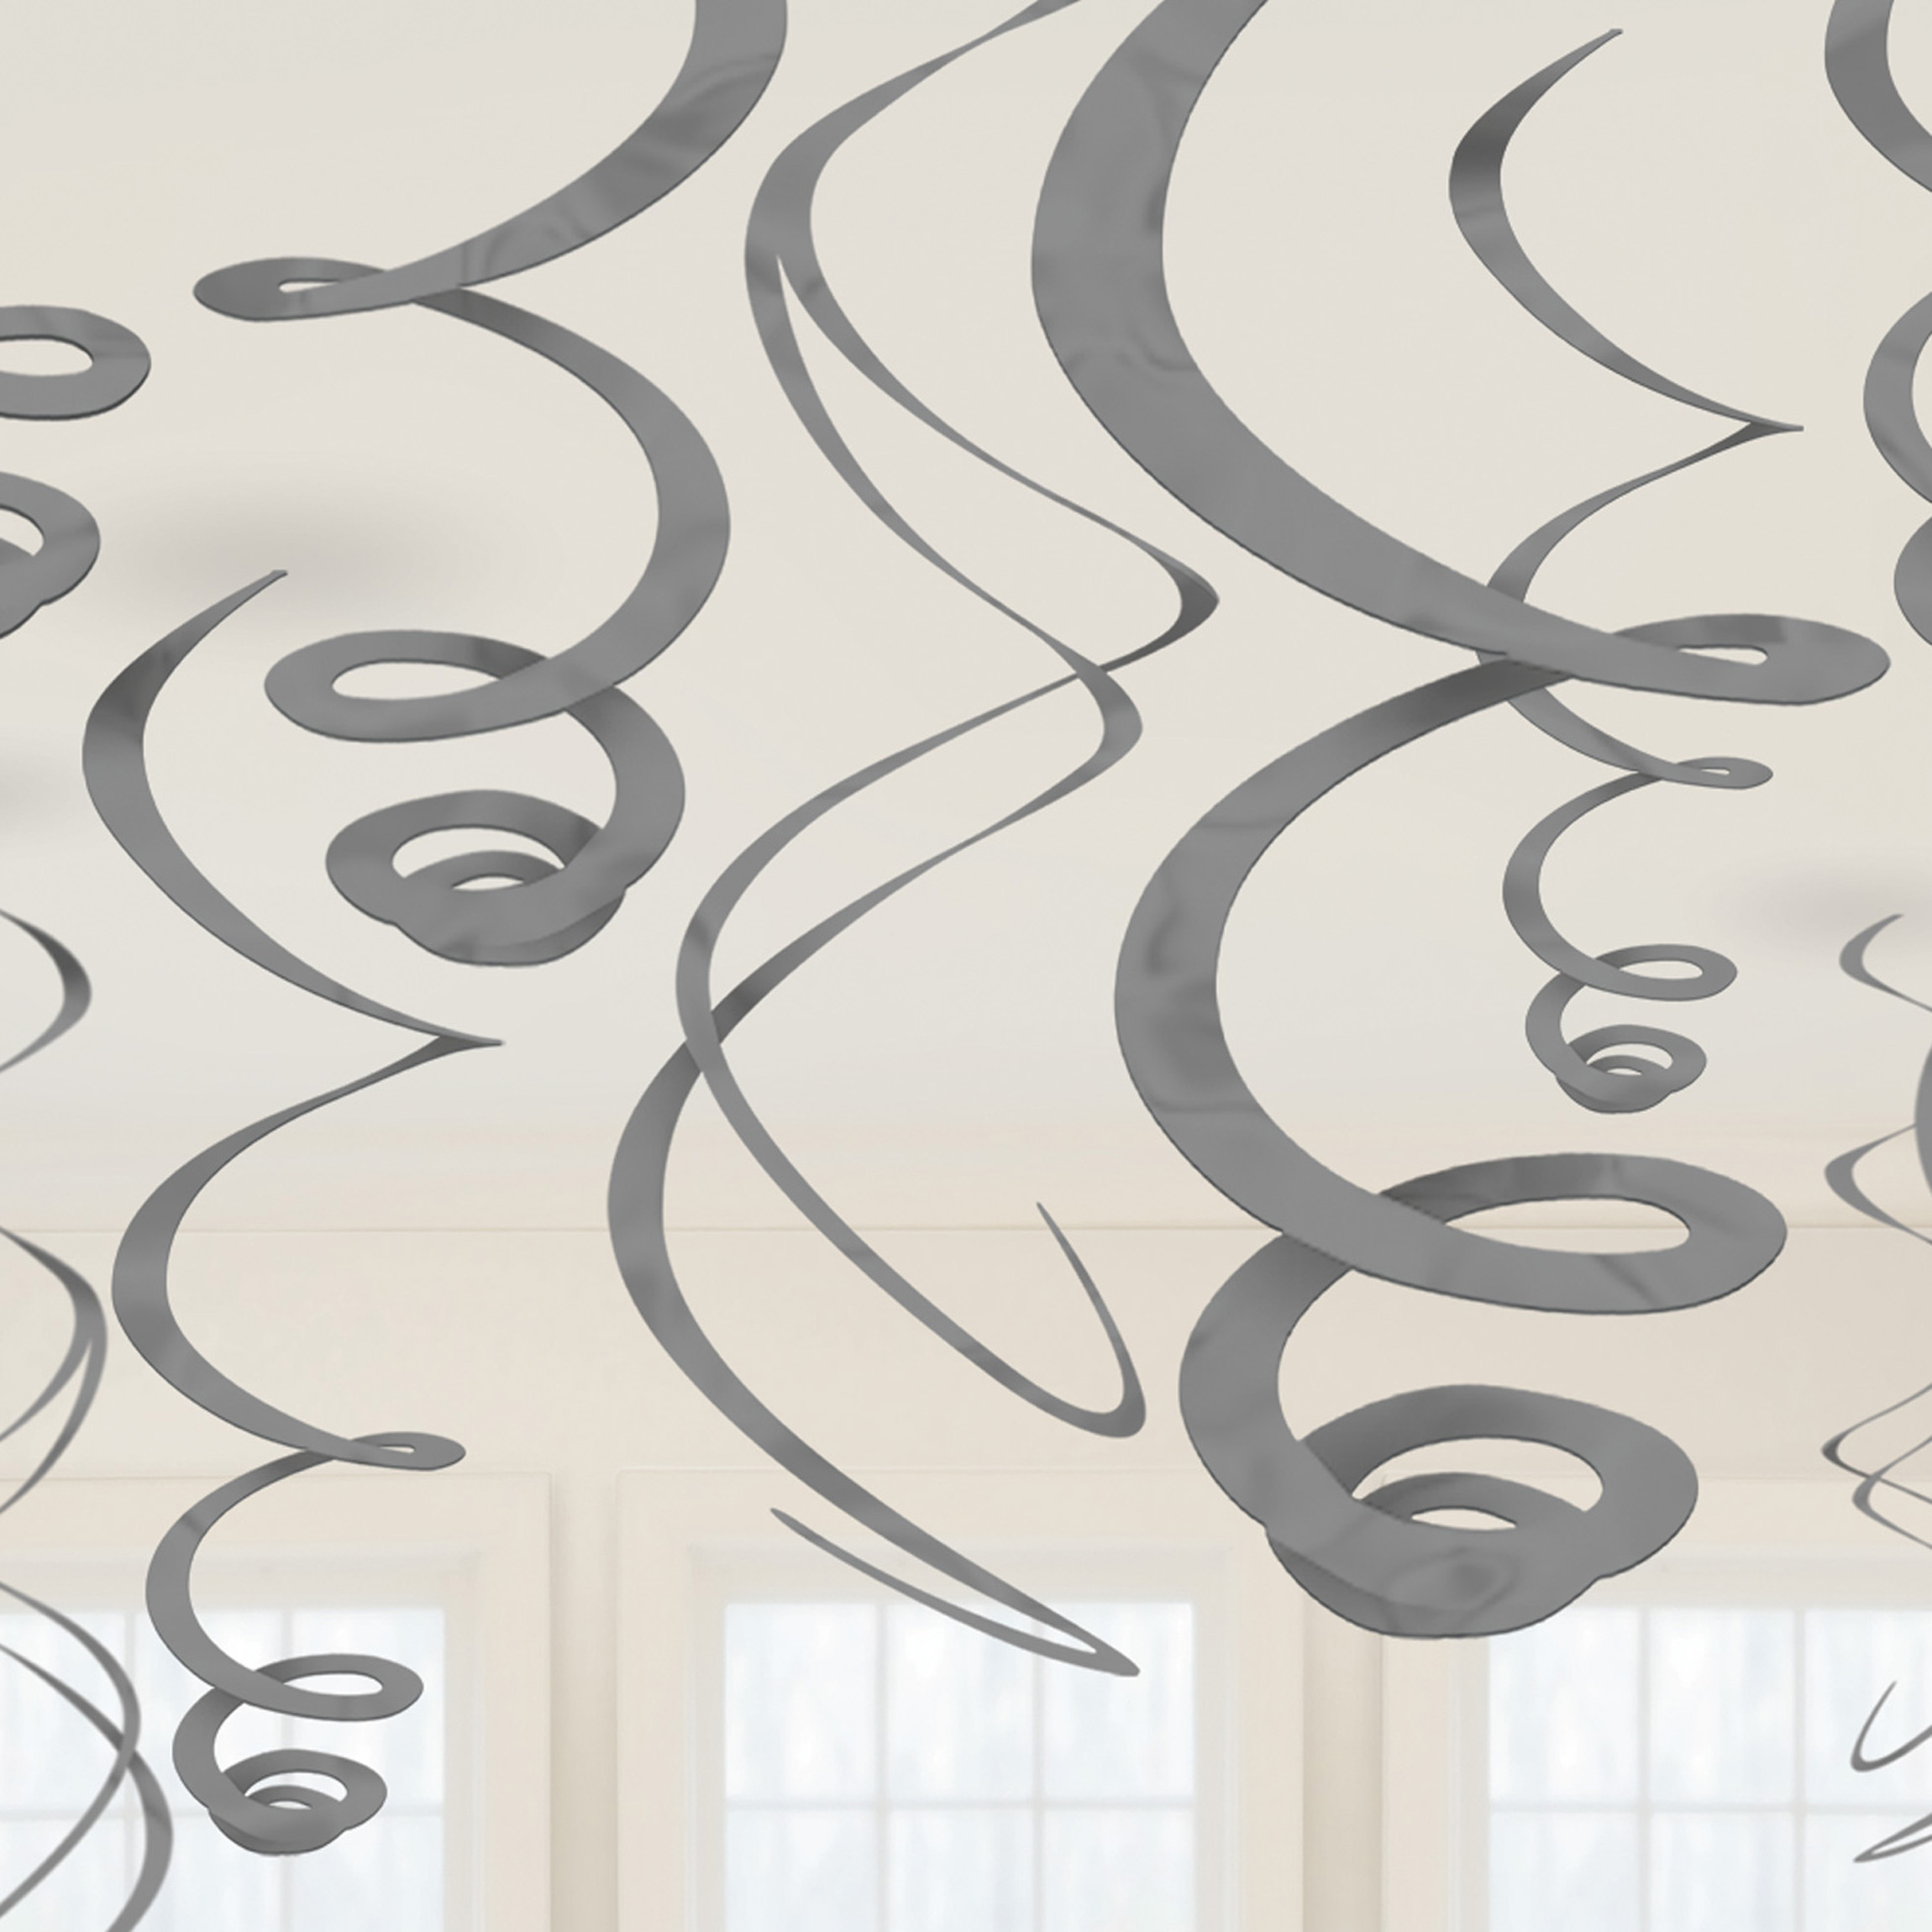 12 Elegante Deko Spiralen Silber 55 8cm Party De